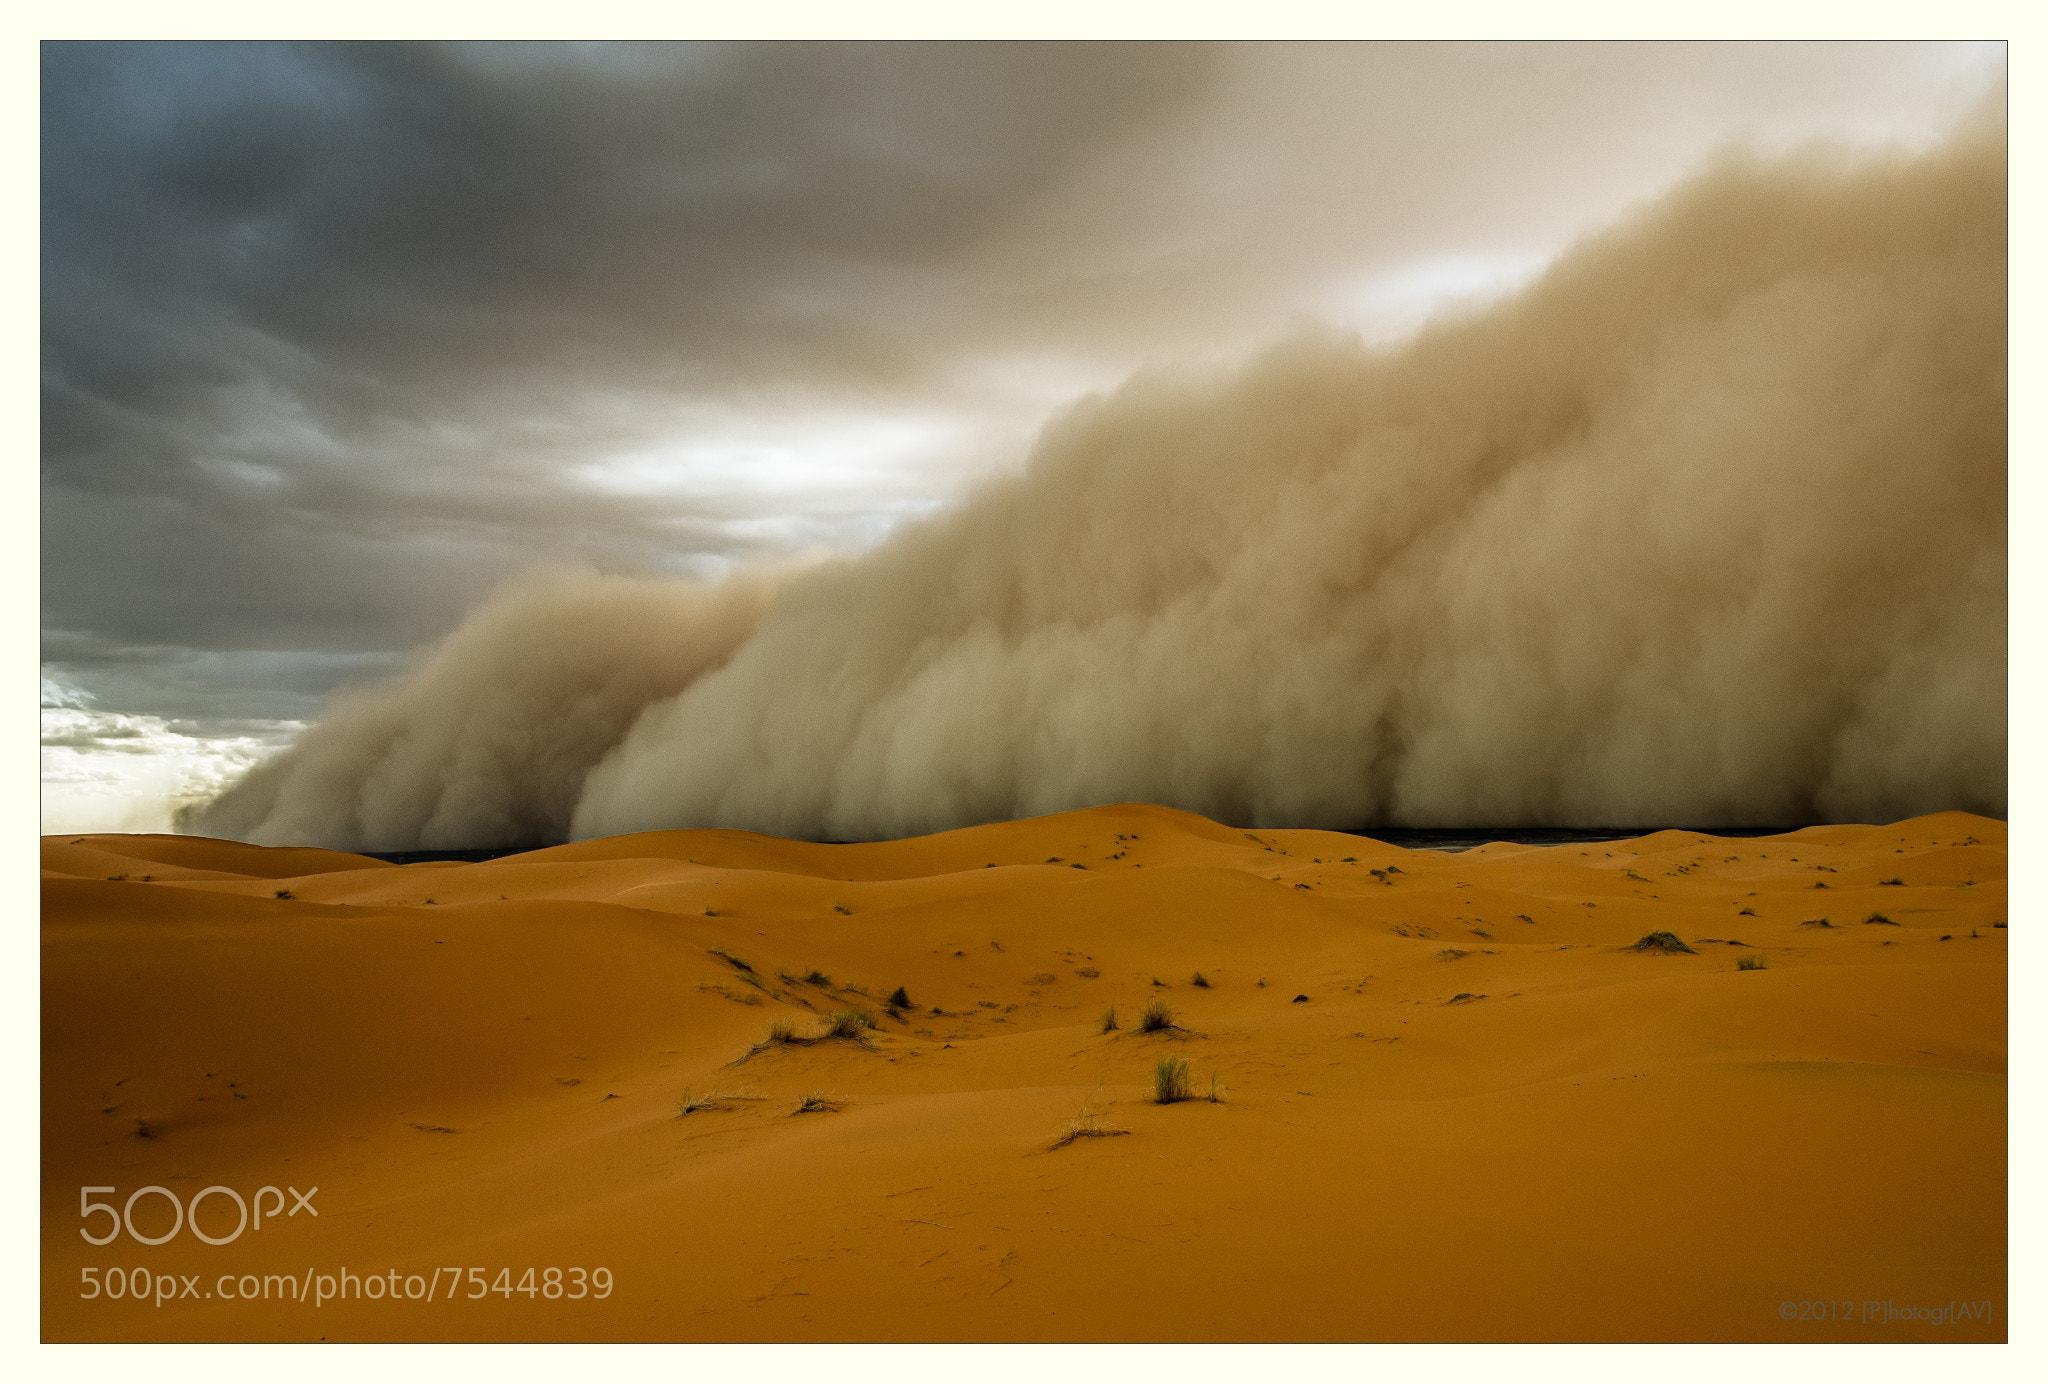 Photograph Sandstorm! by Peter Vruggink on 500px